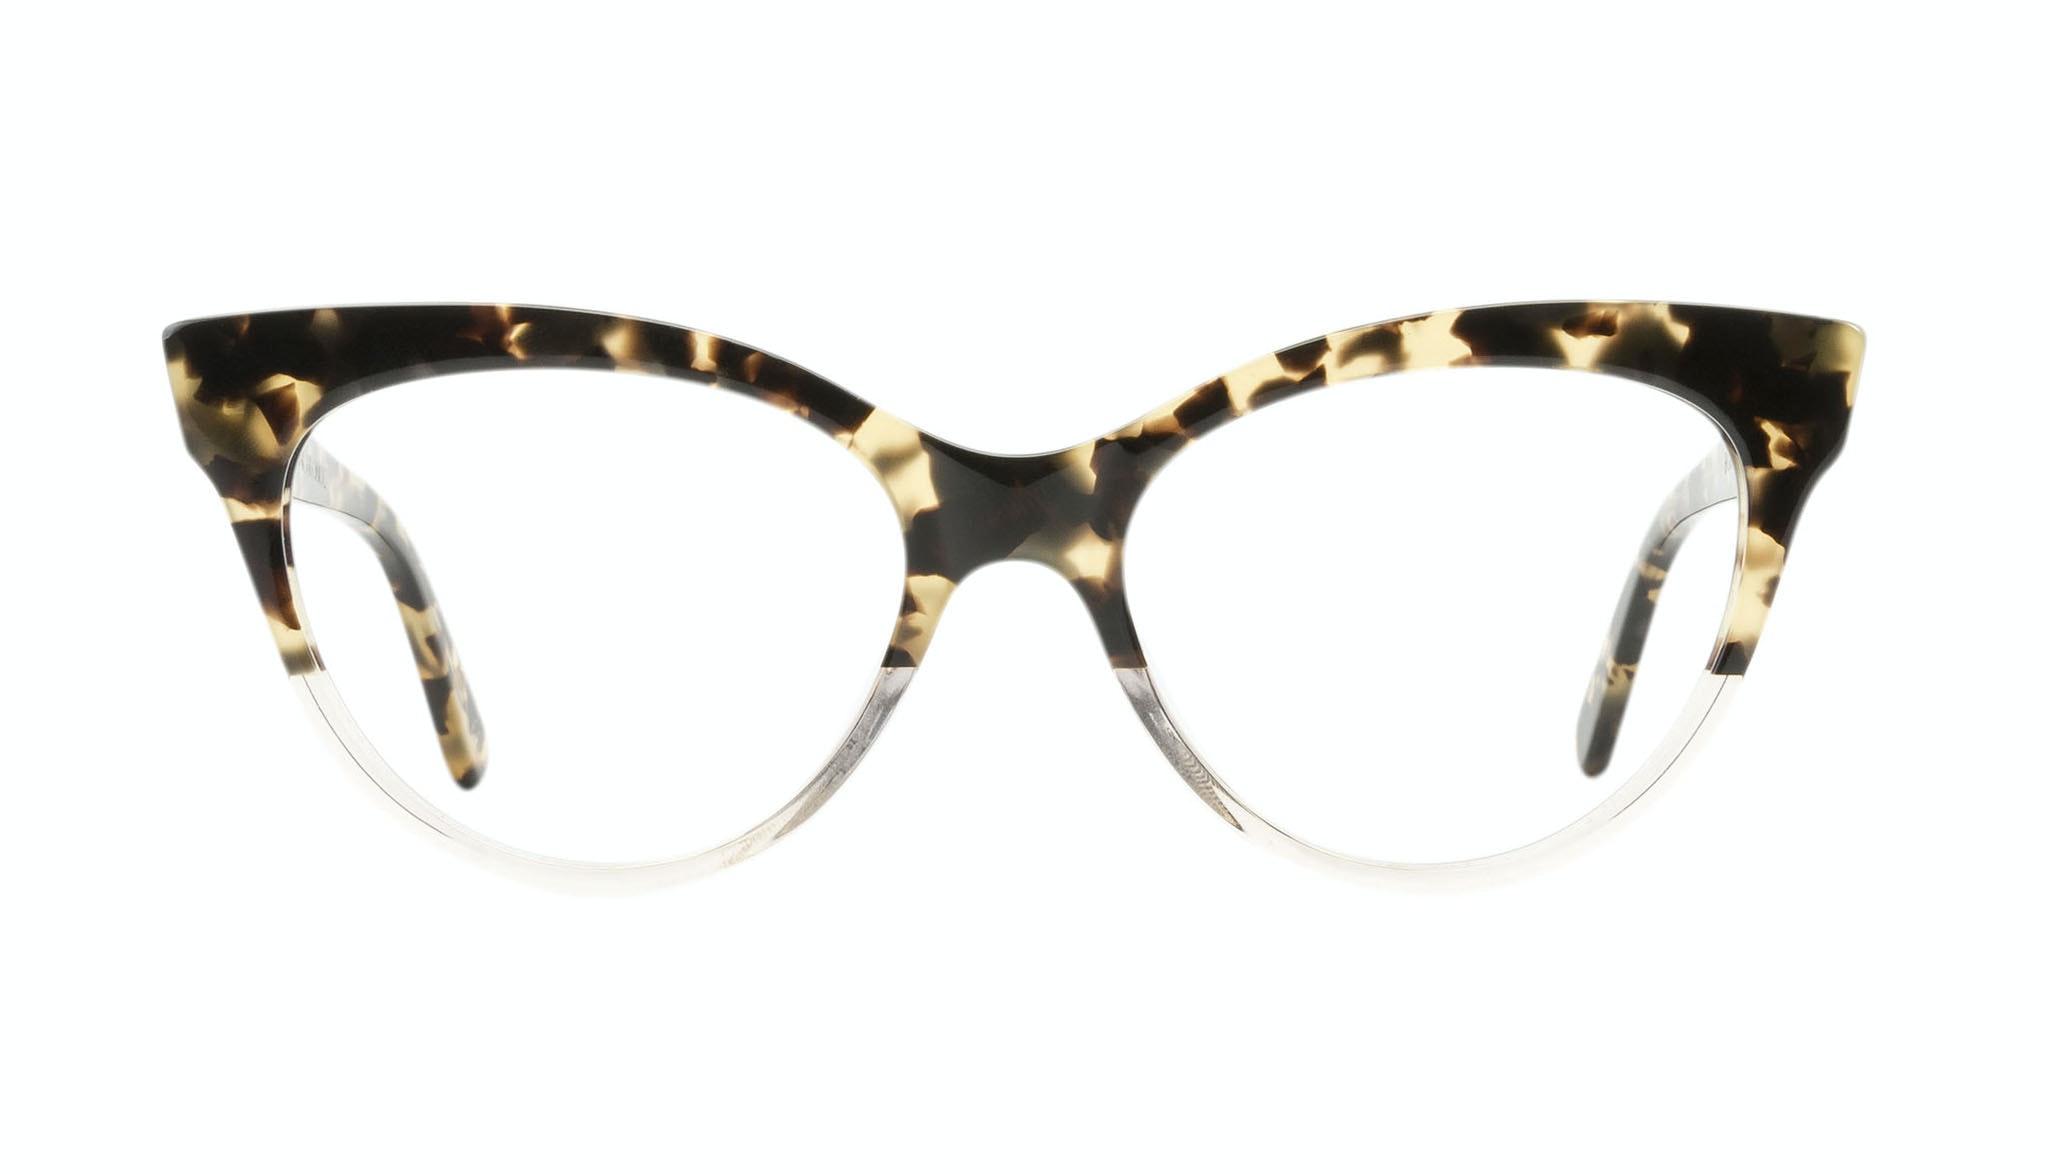 Affordable Fashion Glasses Cat Eye Eyeglasses Women SkunkBoy Champagne Tort Front